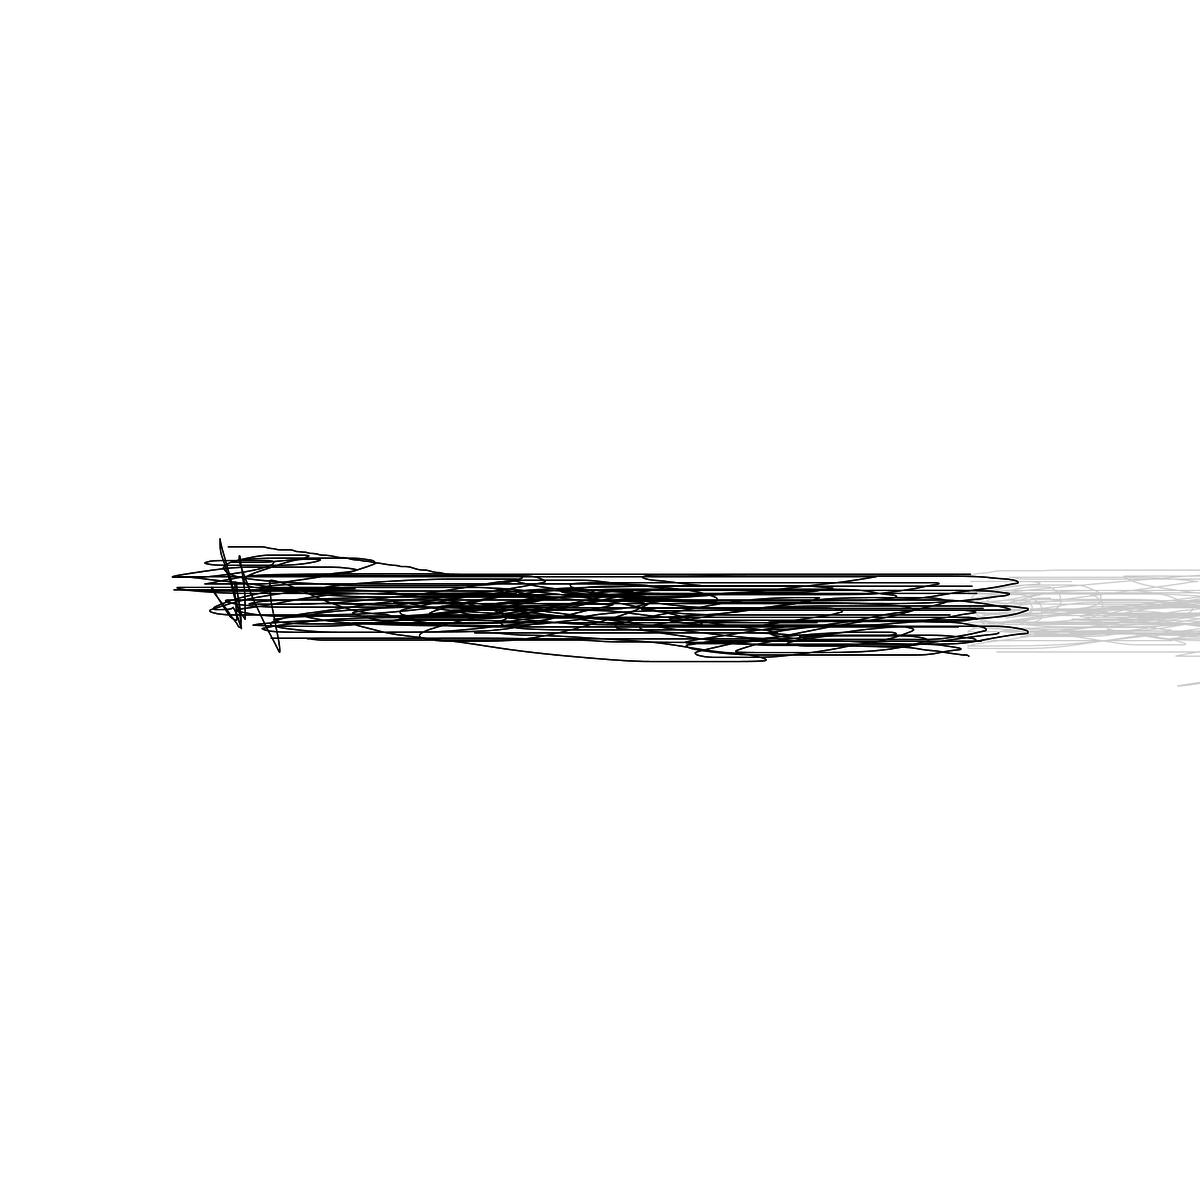 BAAAM drawing#11398 lat:52.4759712219238300lng: 13.4058036804199220